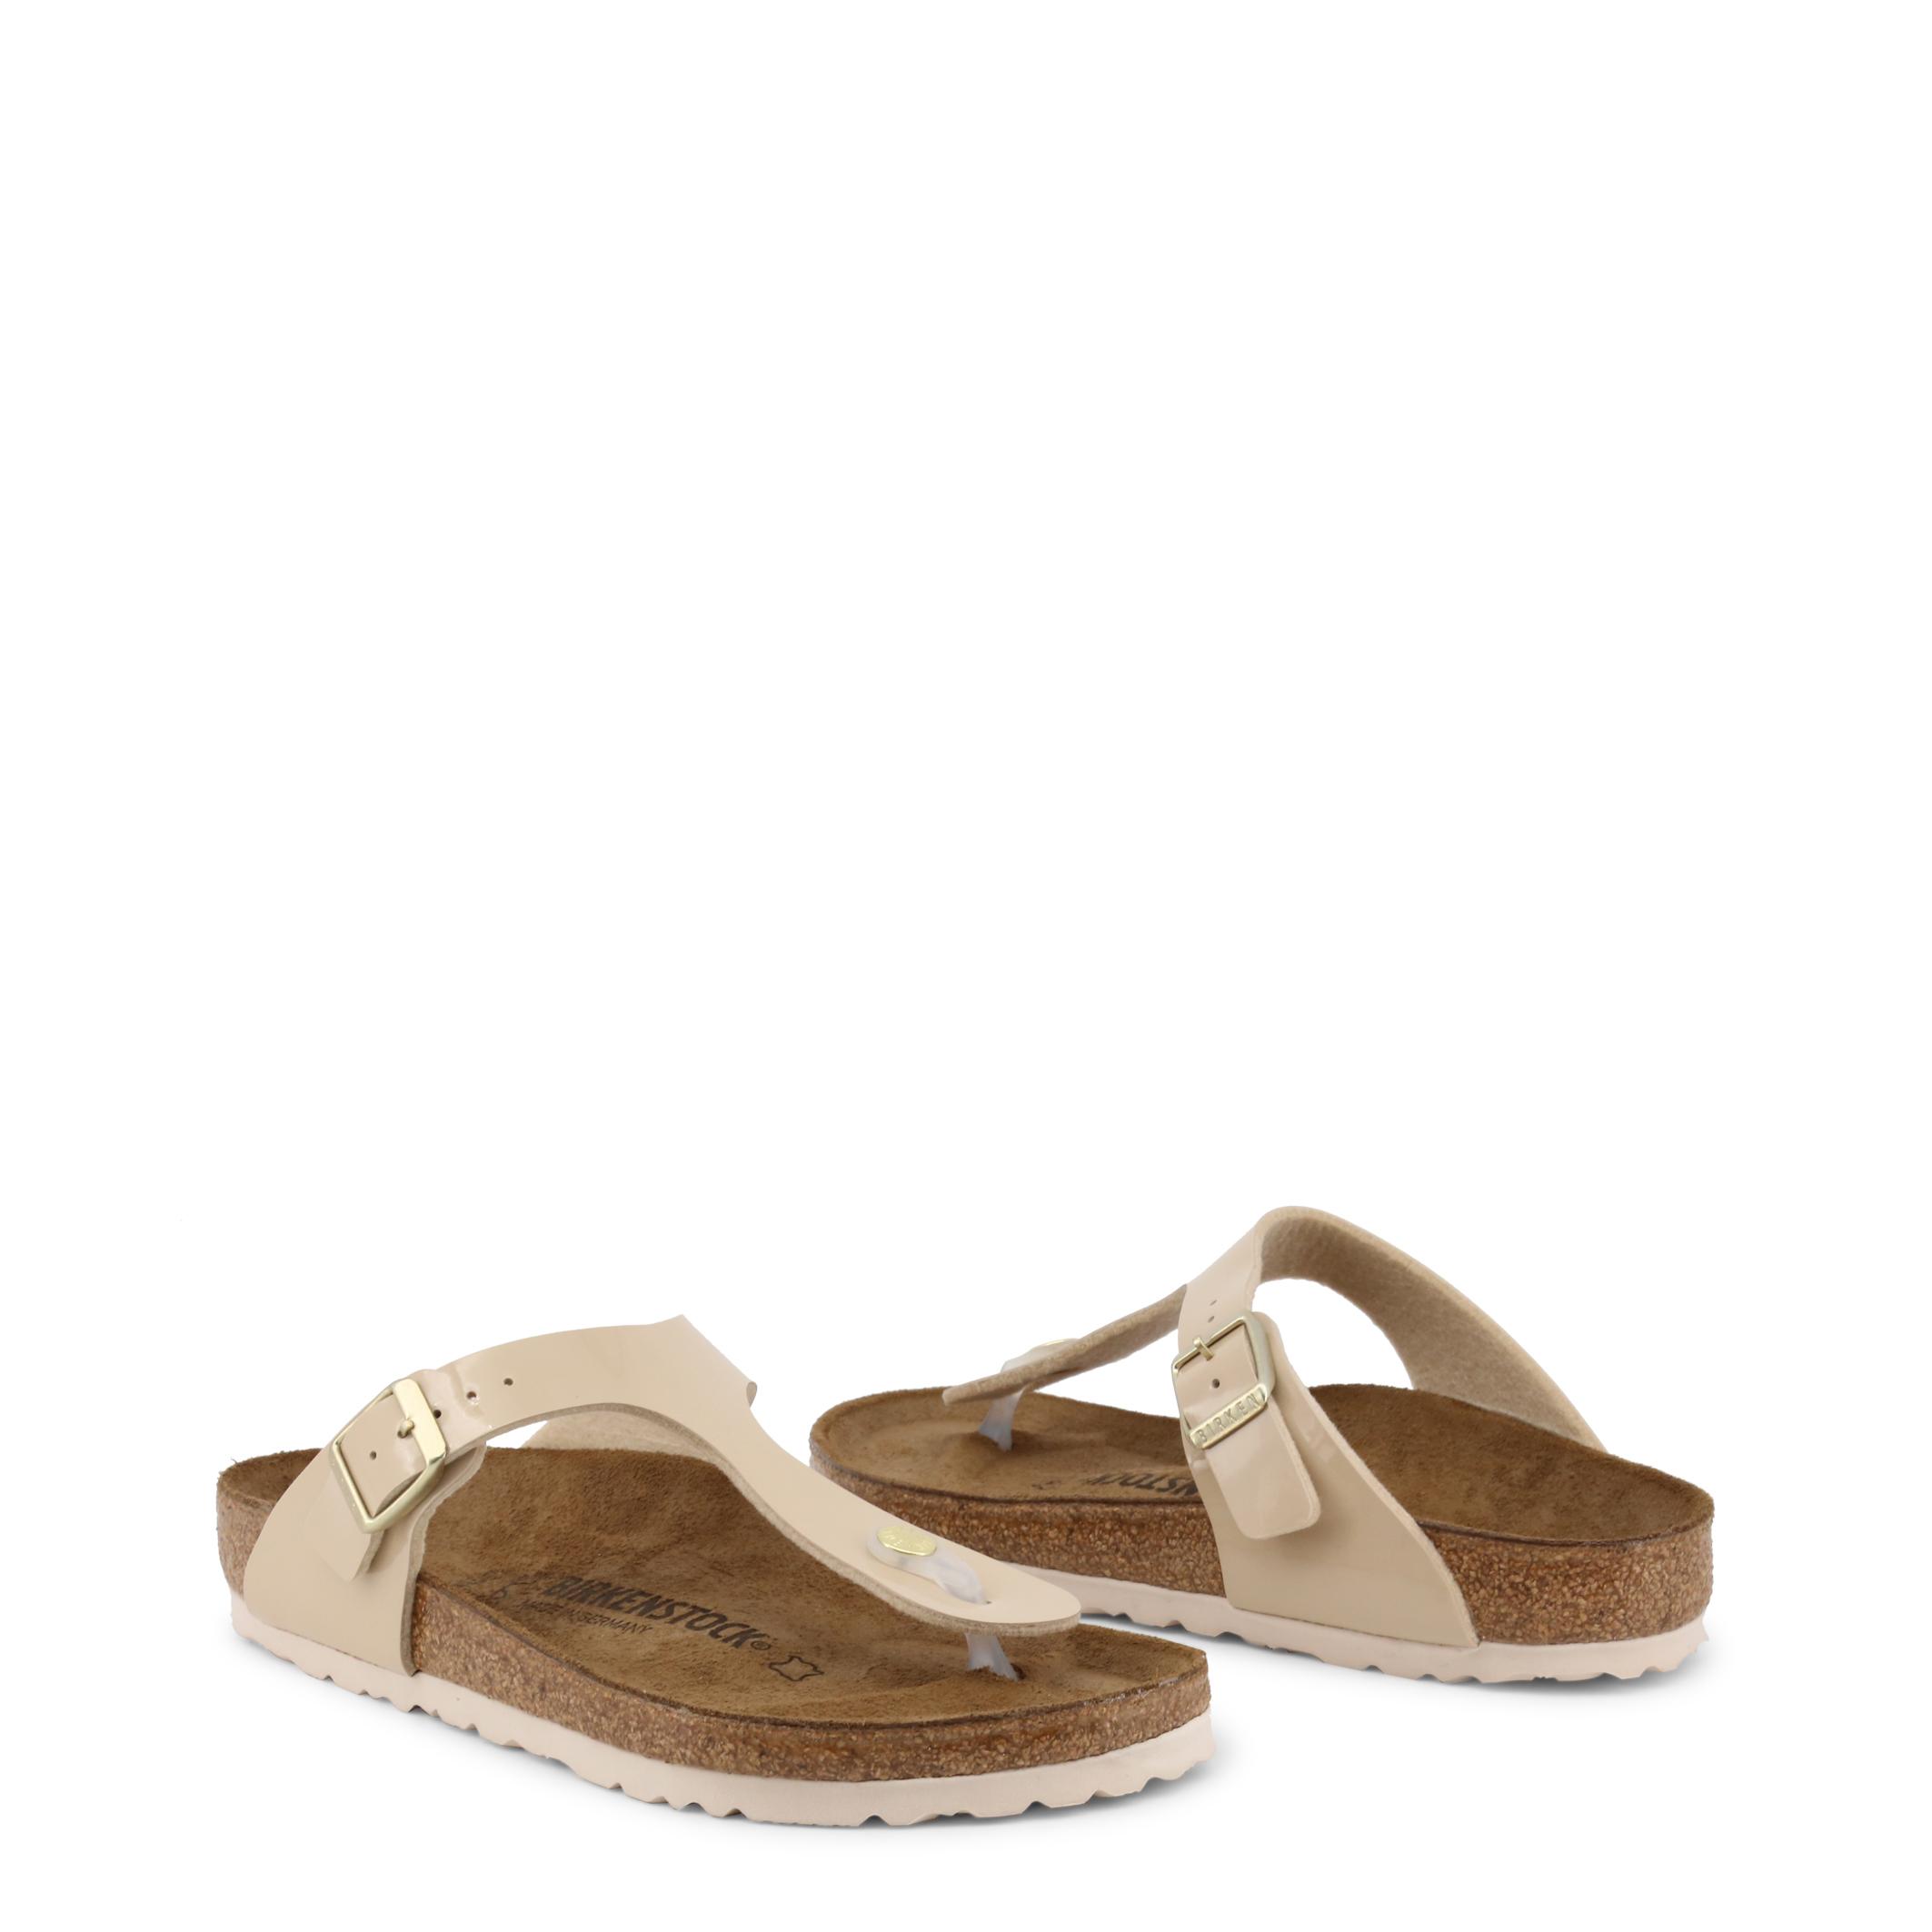 Tongs / Mules  Birkenstock GIZEH_BIRKO-FLOR-PATENT brown